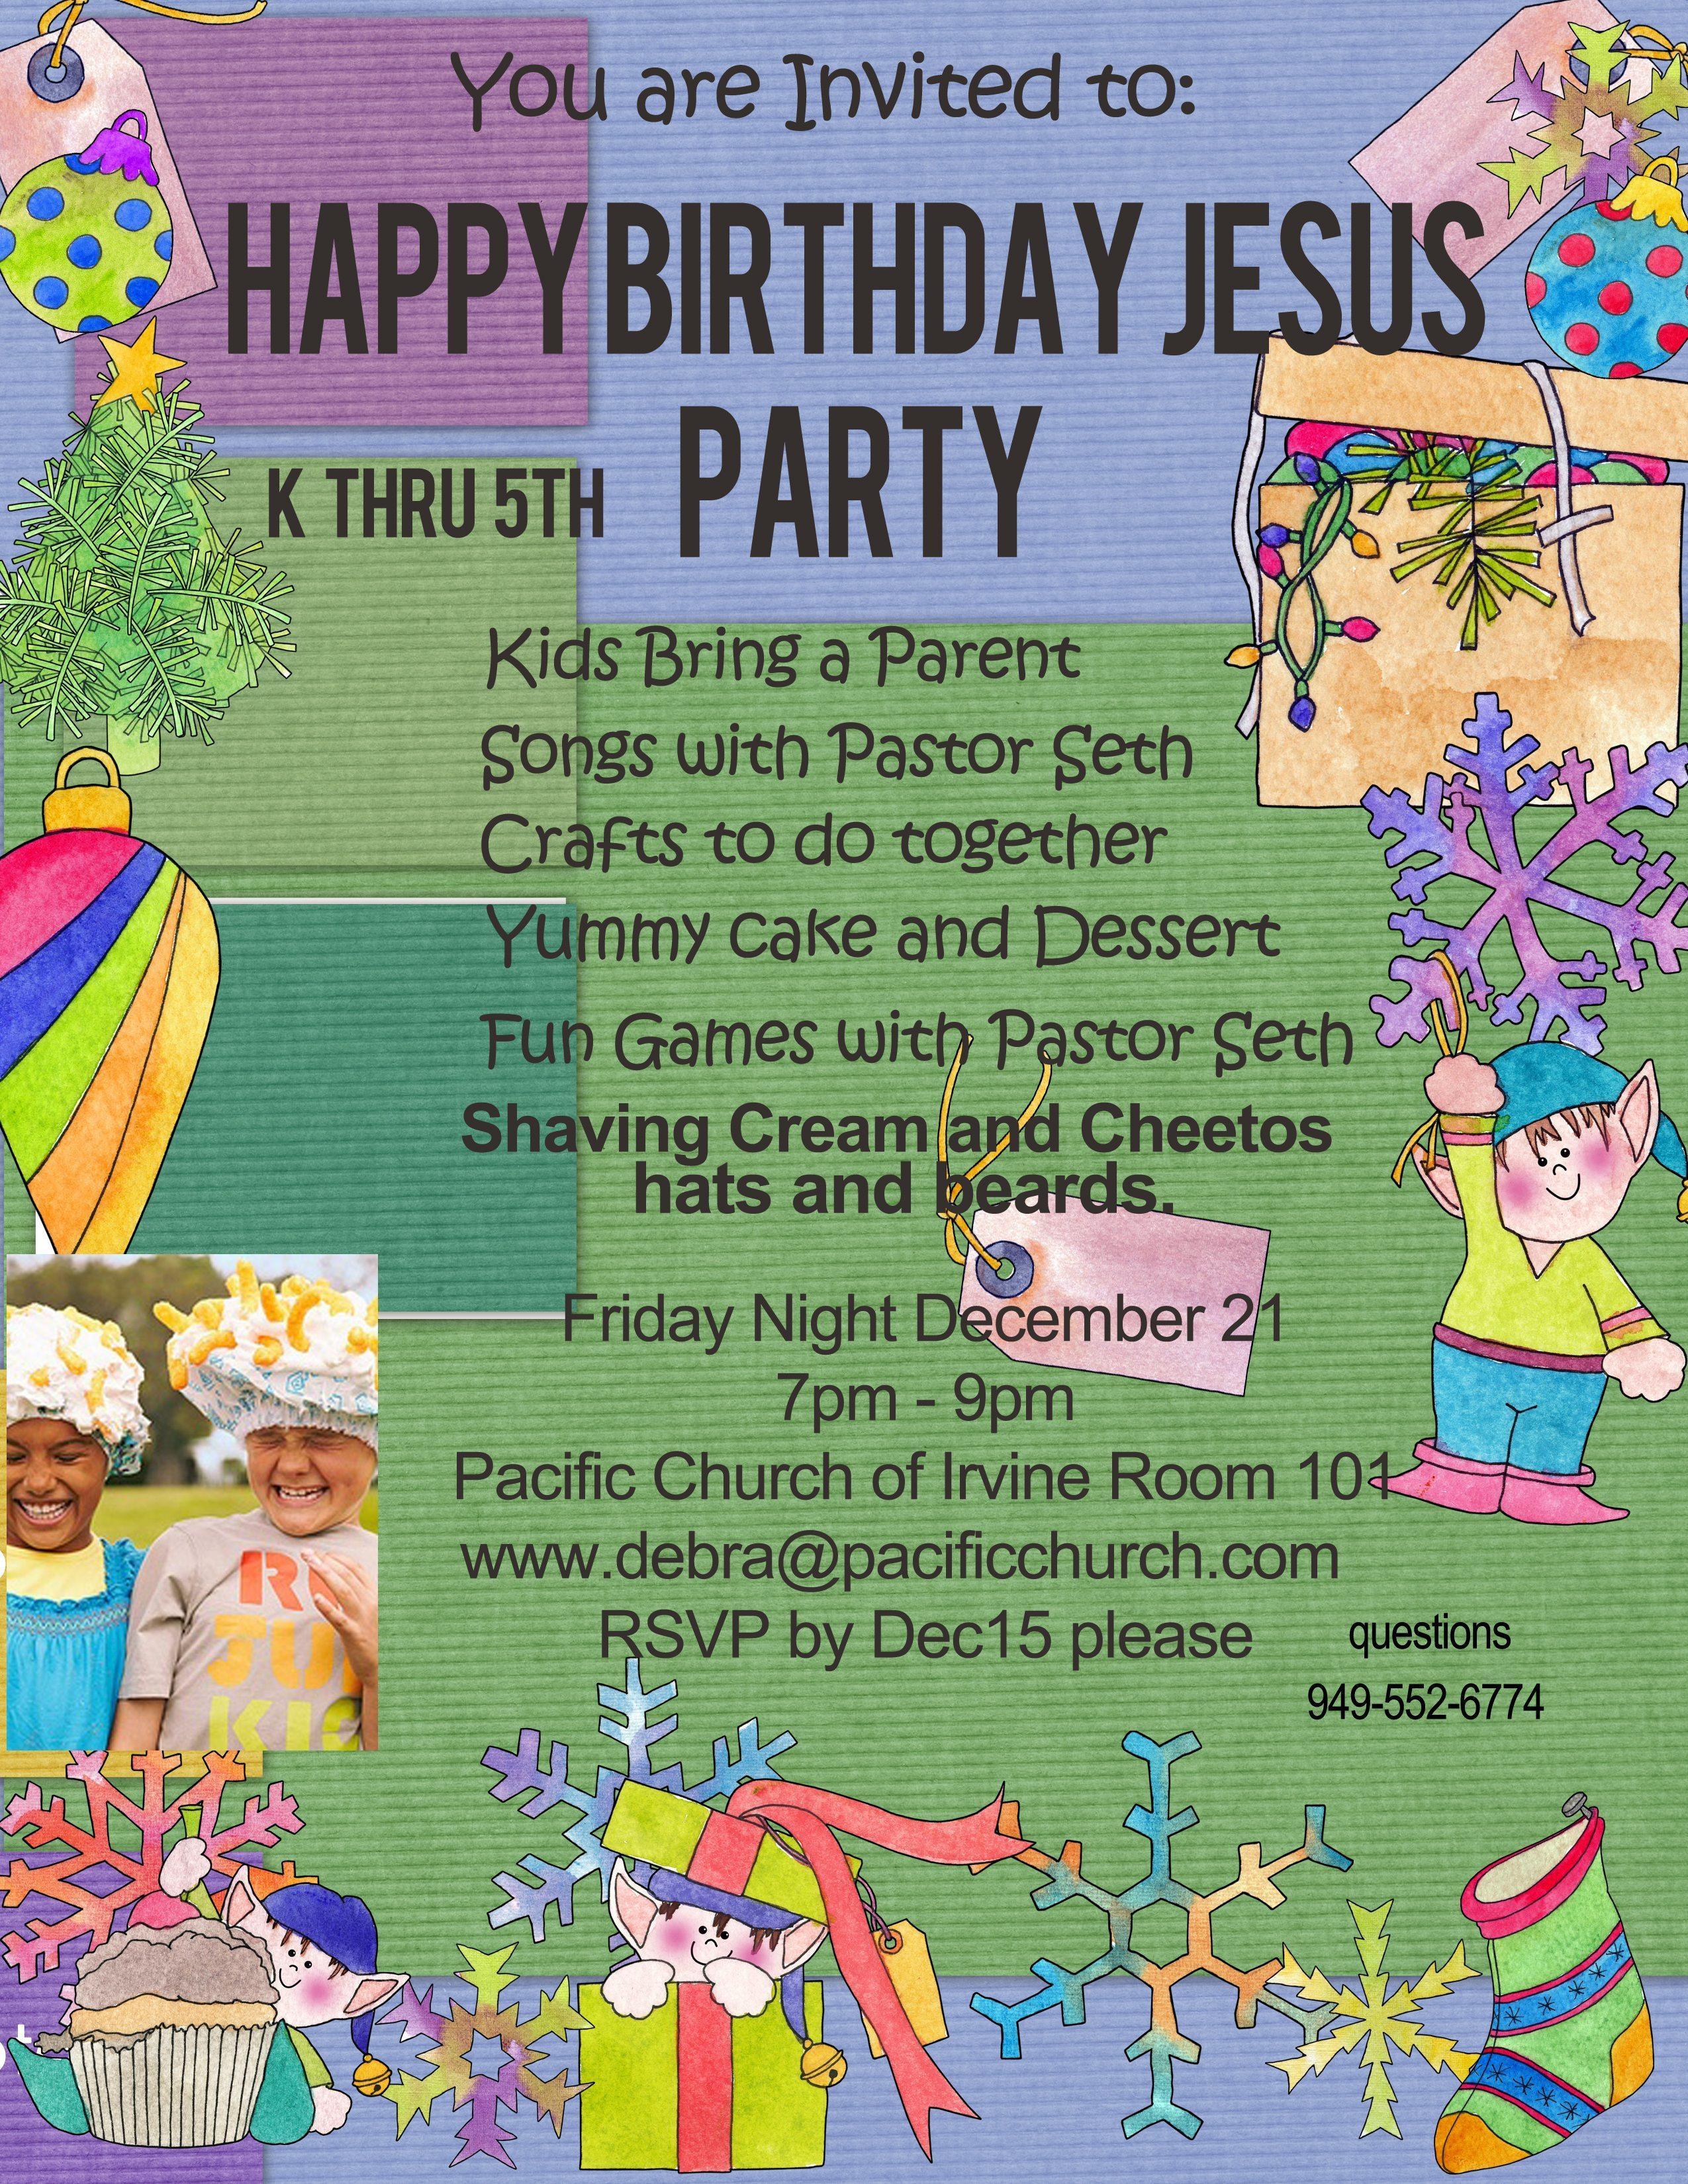 Happy Birthday Jesus Party Churches in Irvine CA Pacific – Happy Birthday Jesus Invitations